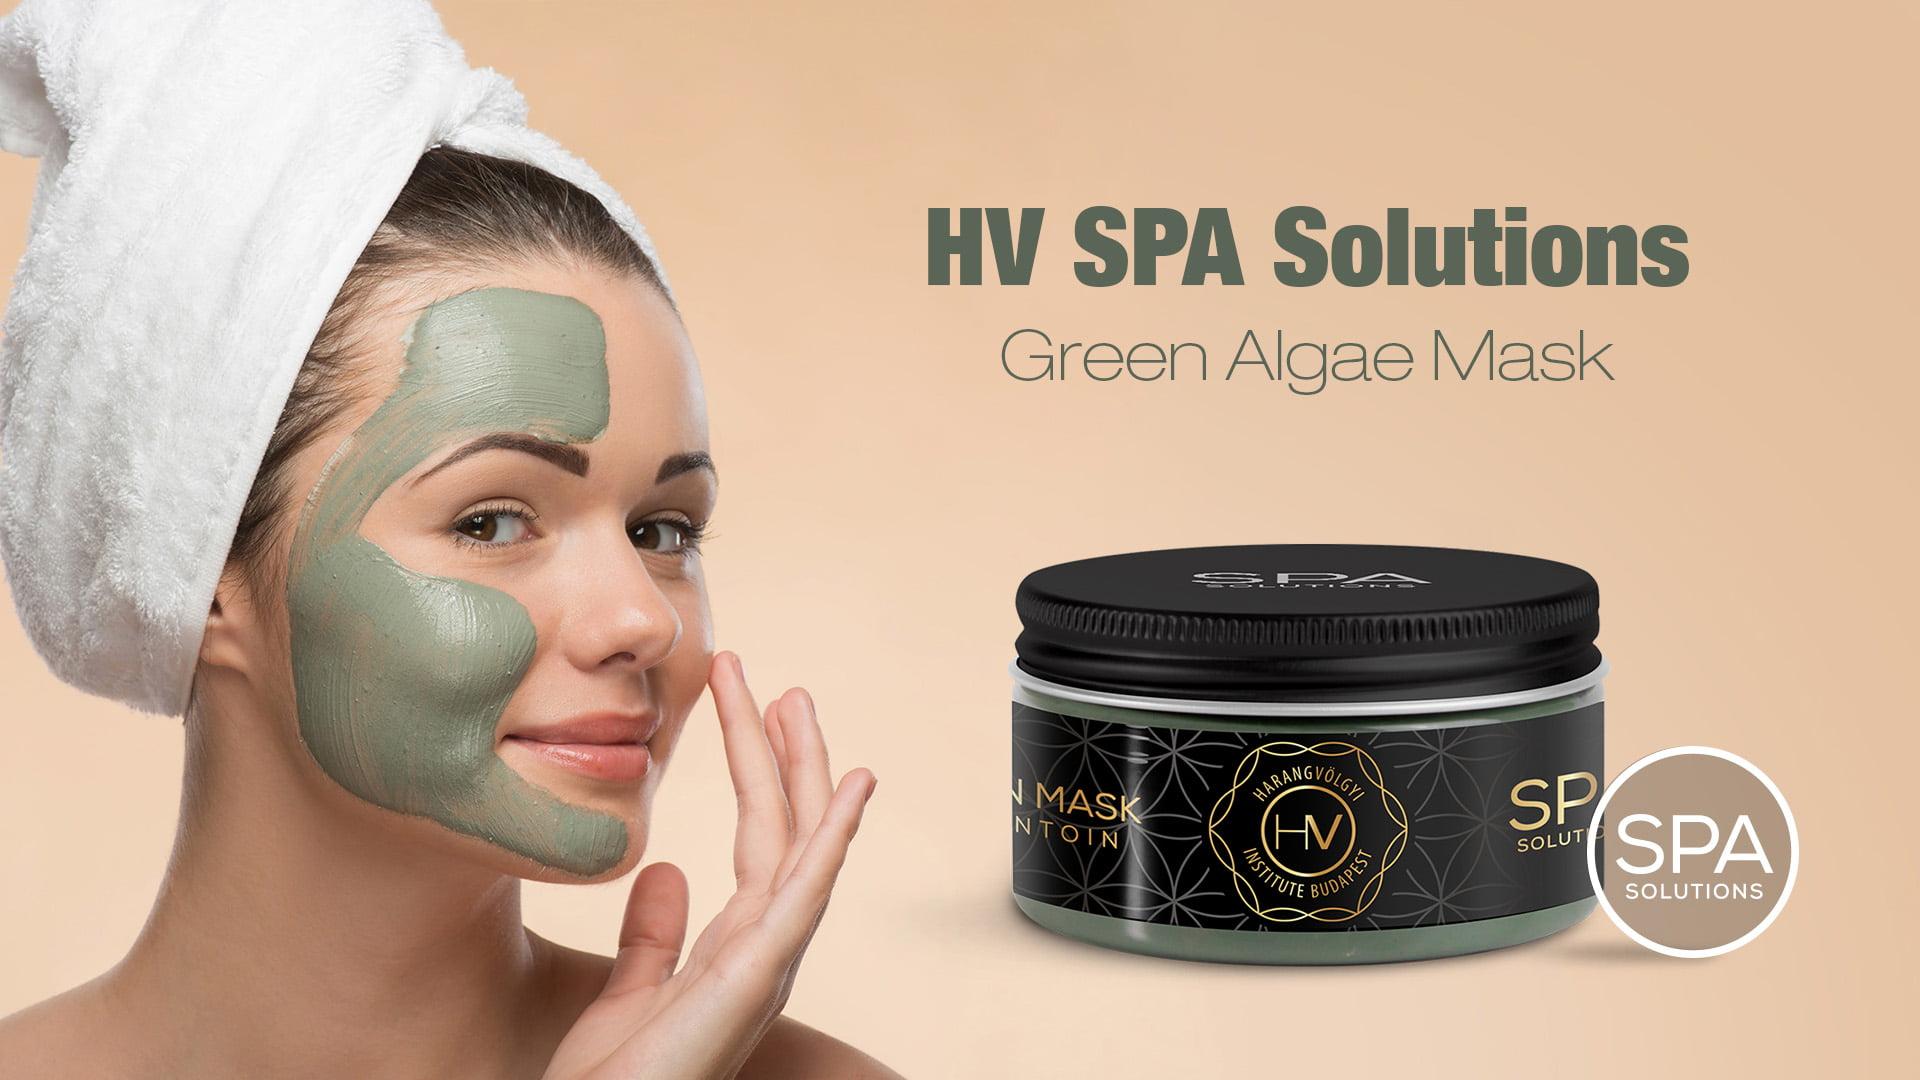 HV SPA Solutions Green Algae Mask